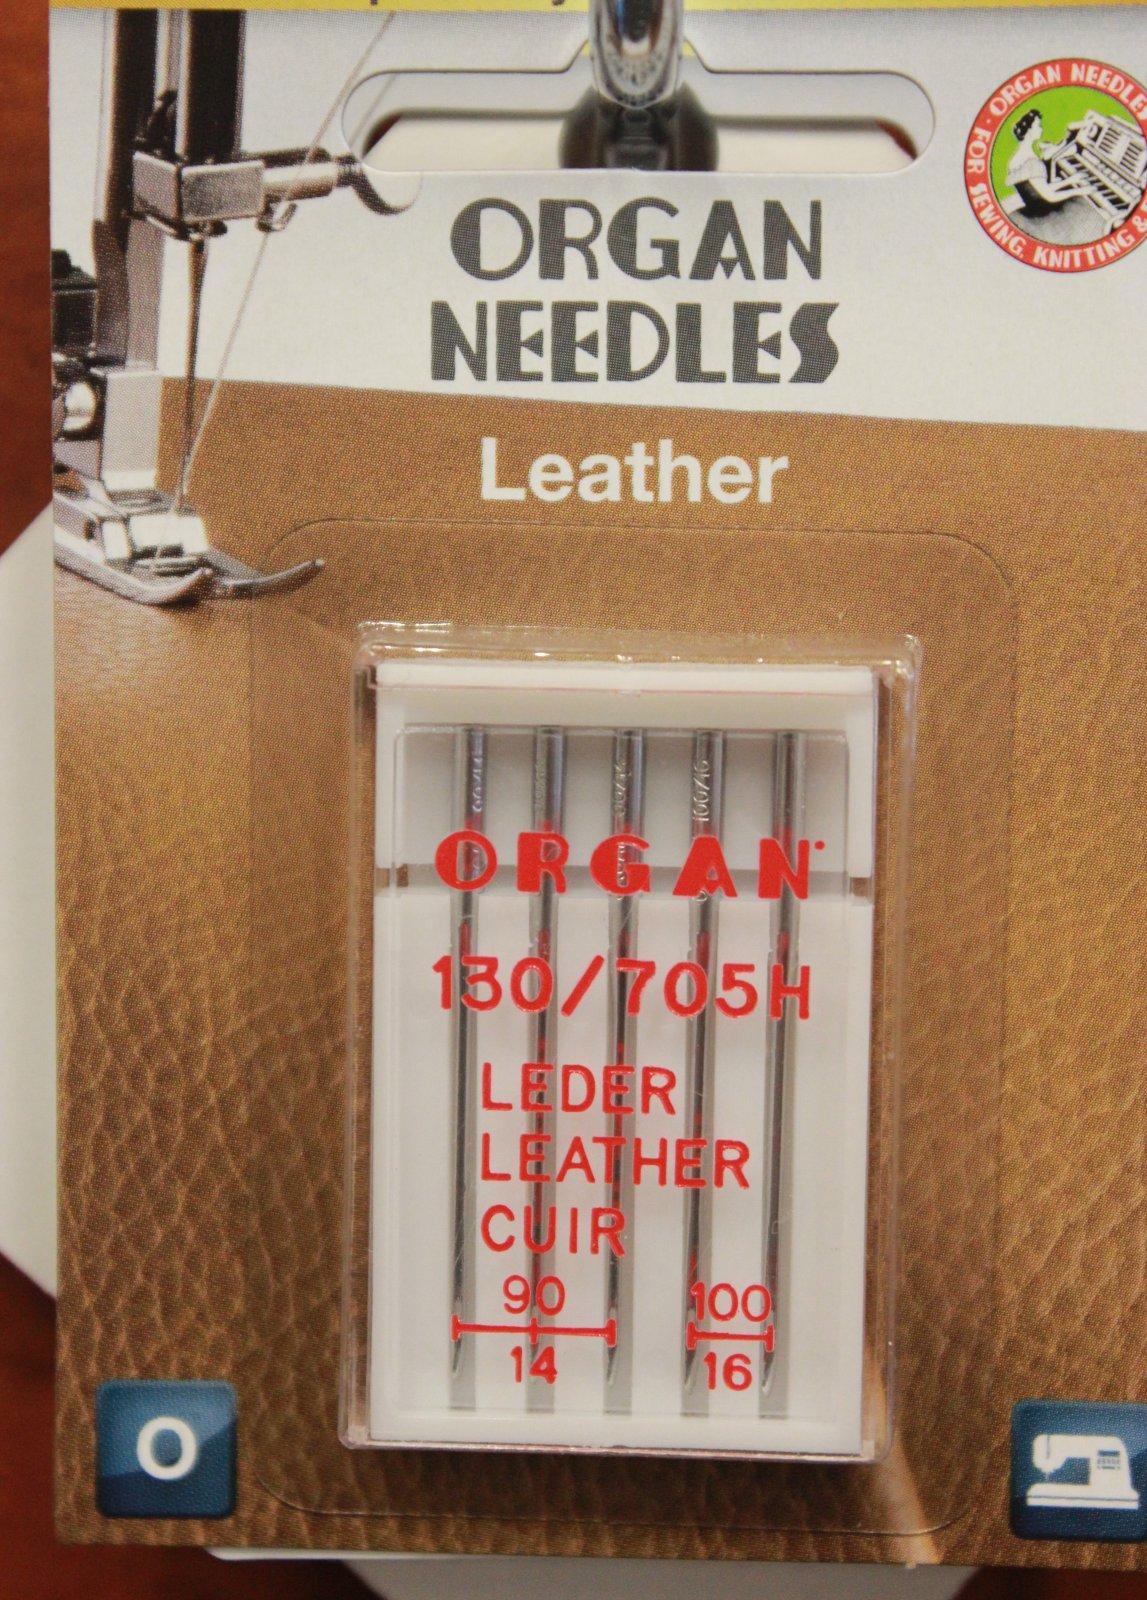 Organ Needles Leather Astd